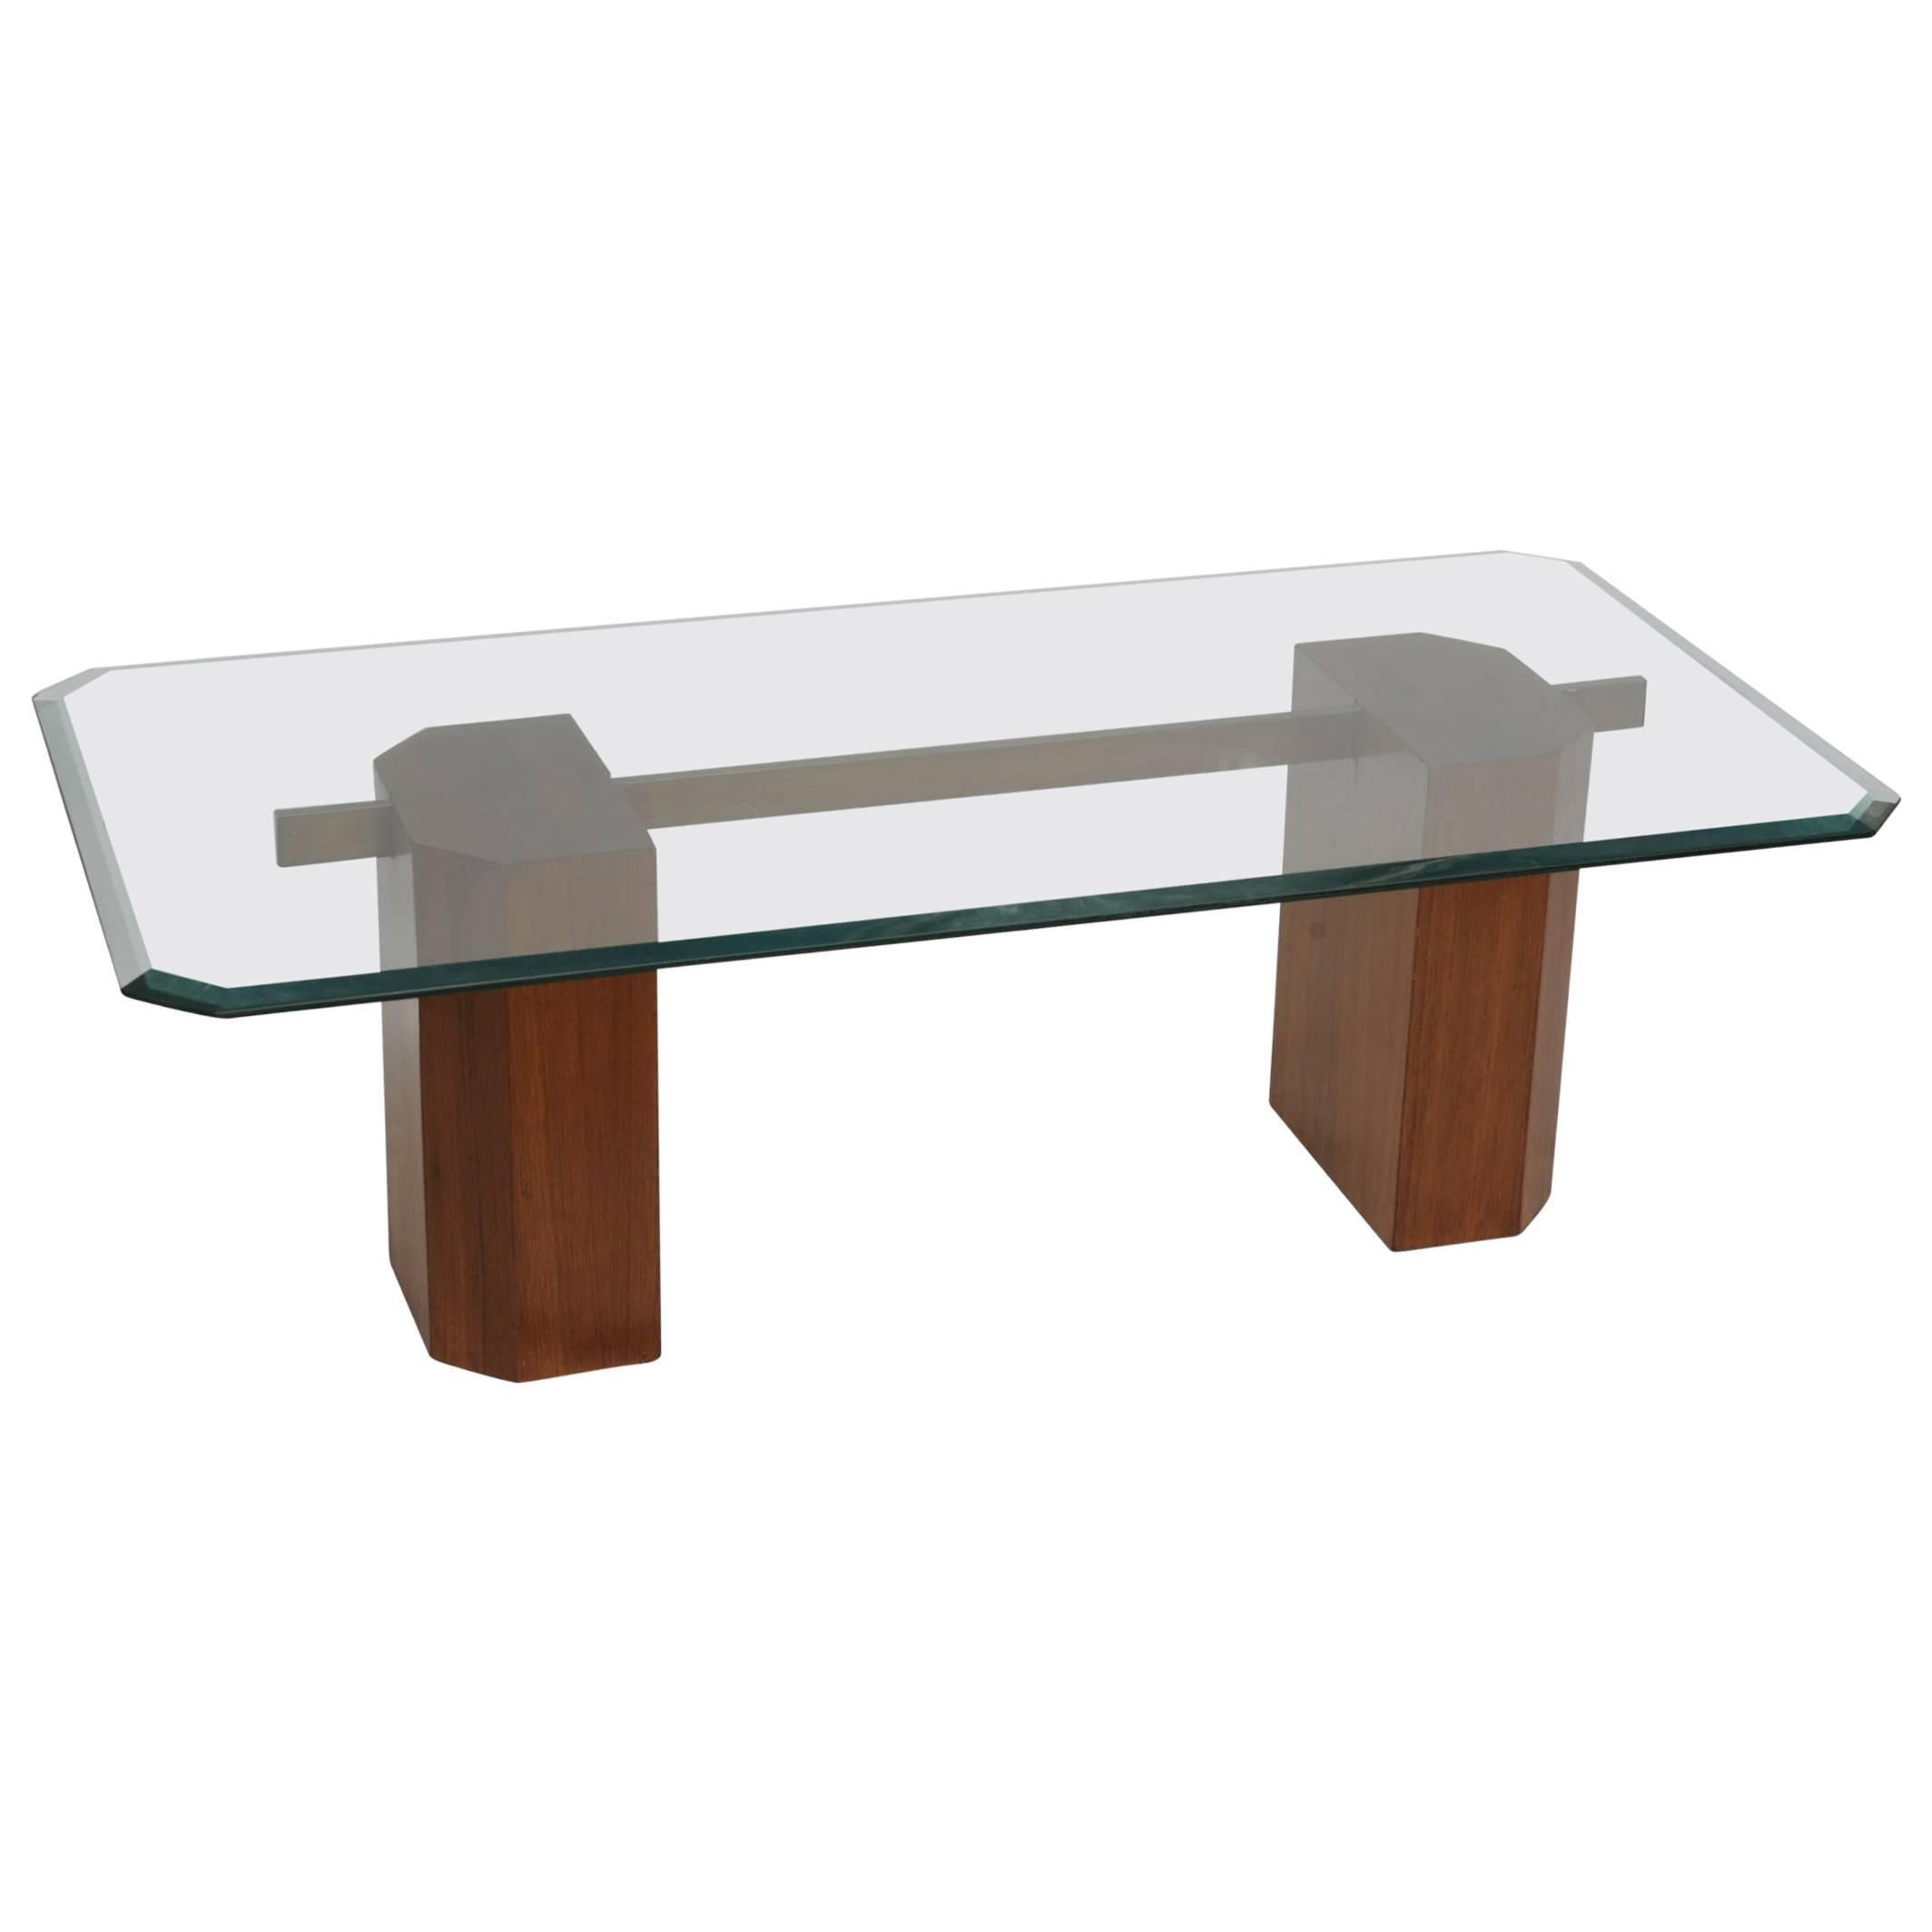 Danish Mid-Century Modern Solid Teak and Brass Coffee Table